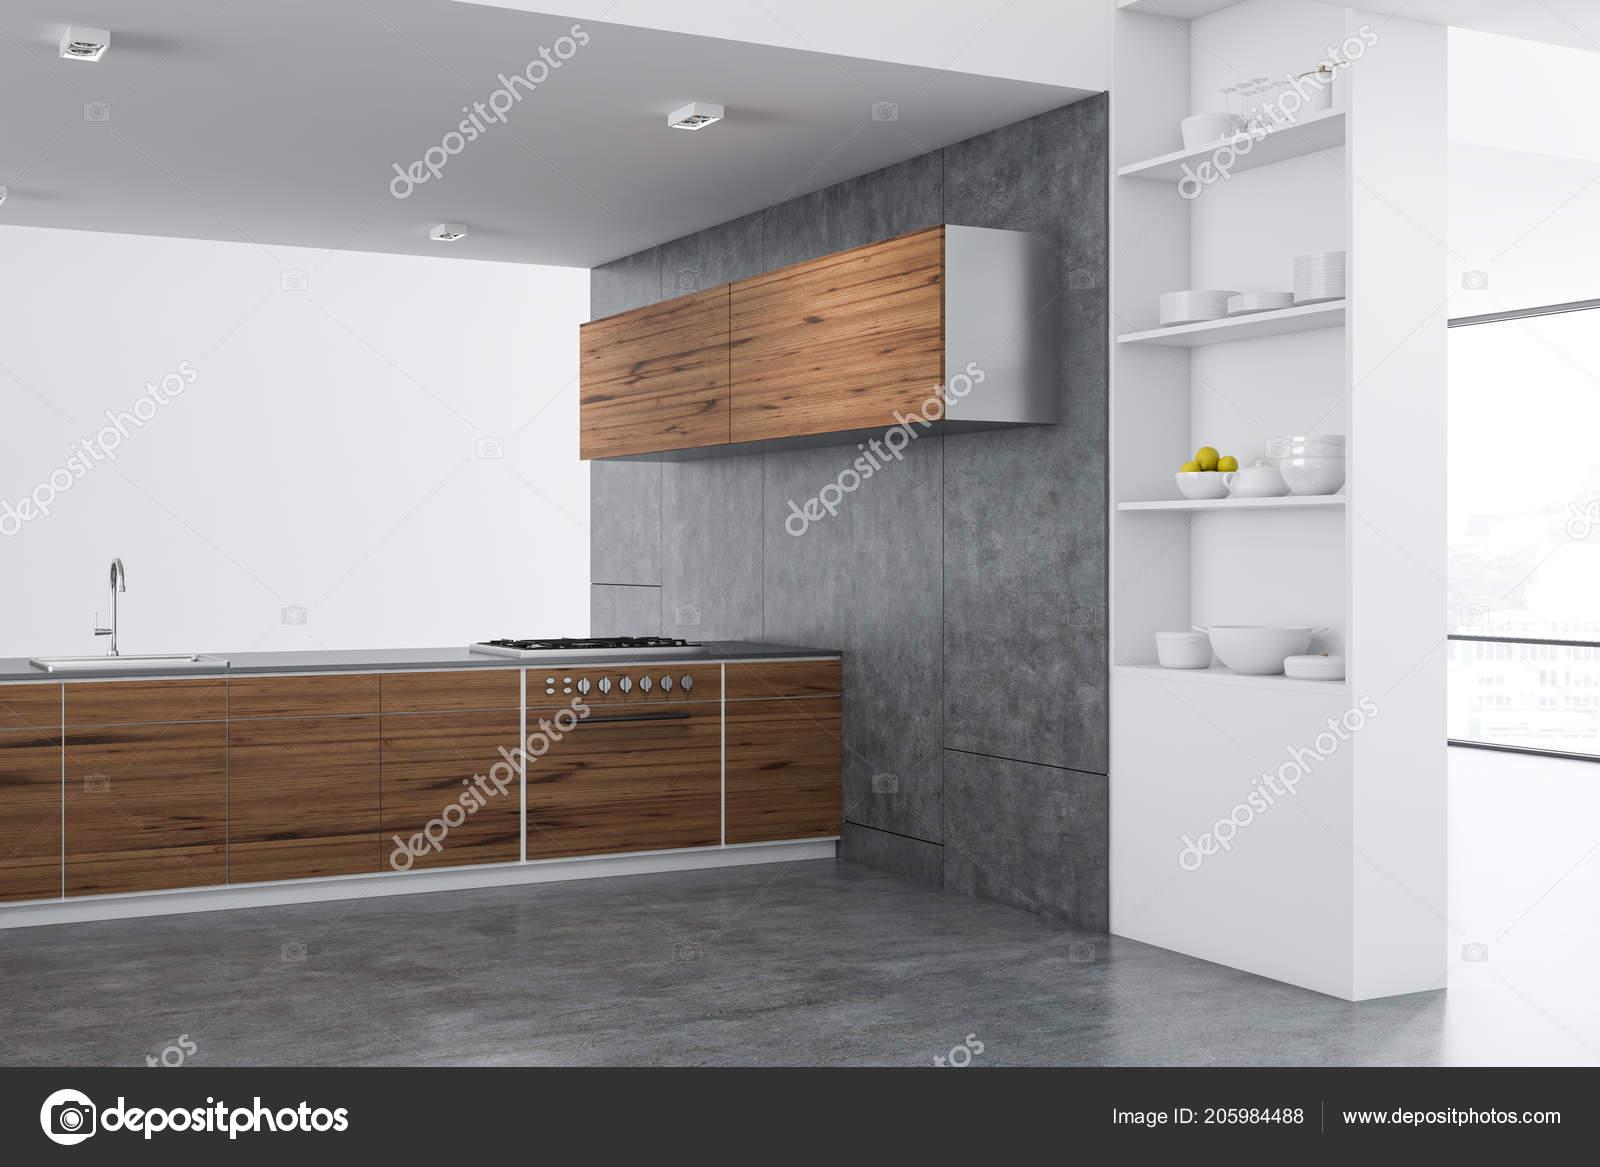 Pictures Kitchen Cupboards Modern Kitchen Corner Wooden Countertops Cupboards Concrete Floor Stylish White Stock Photo C Denisismagilov 205984488,King Bedroom Furniture Sets